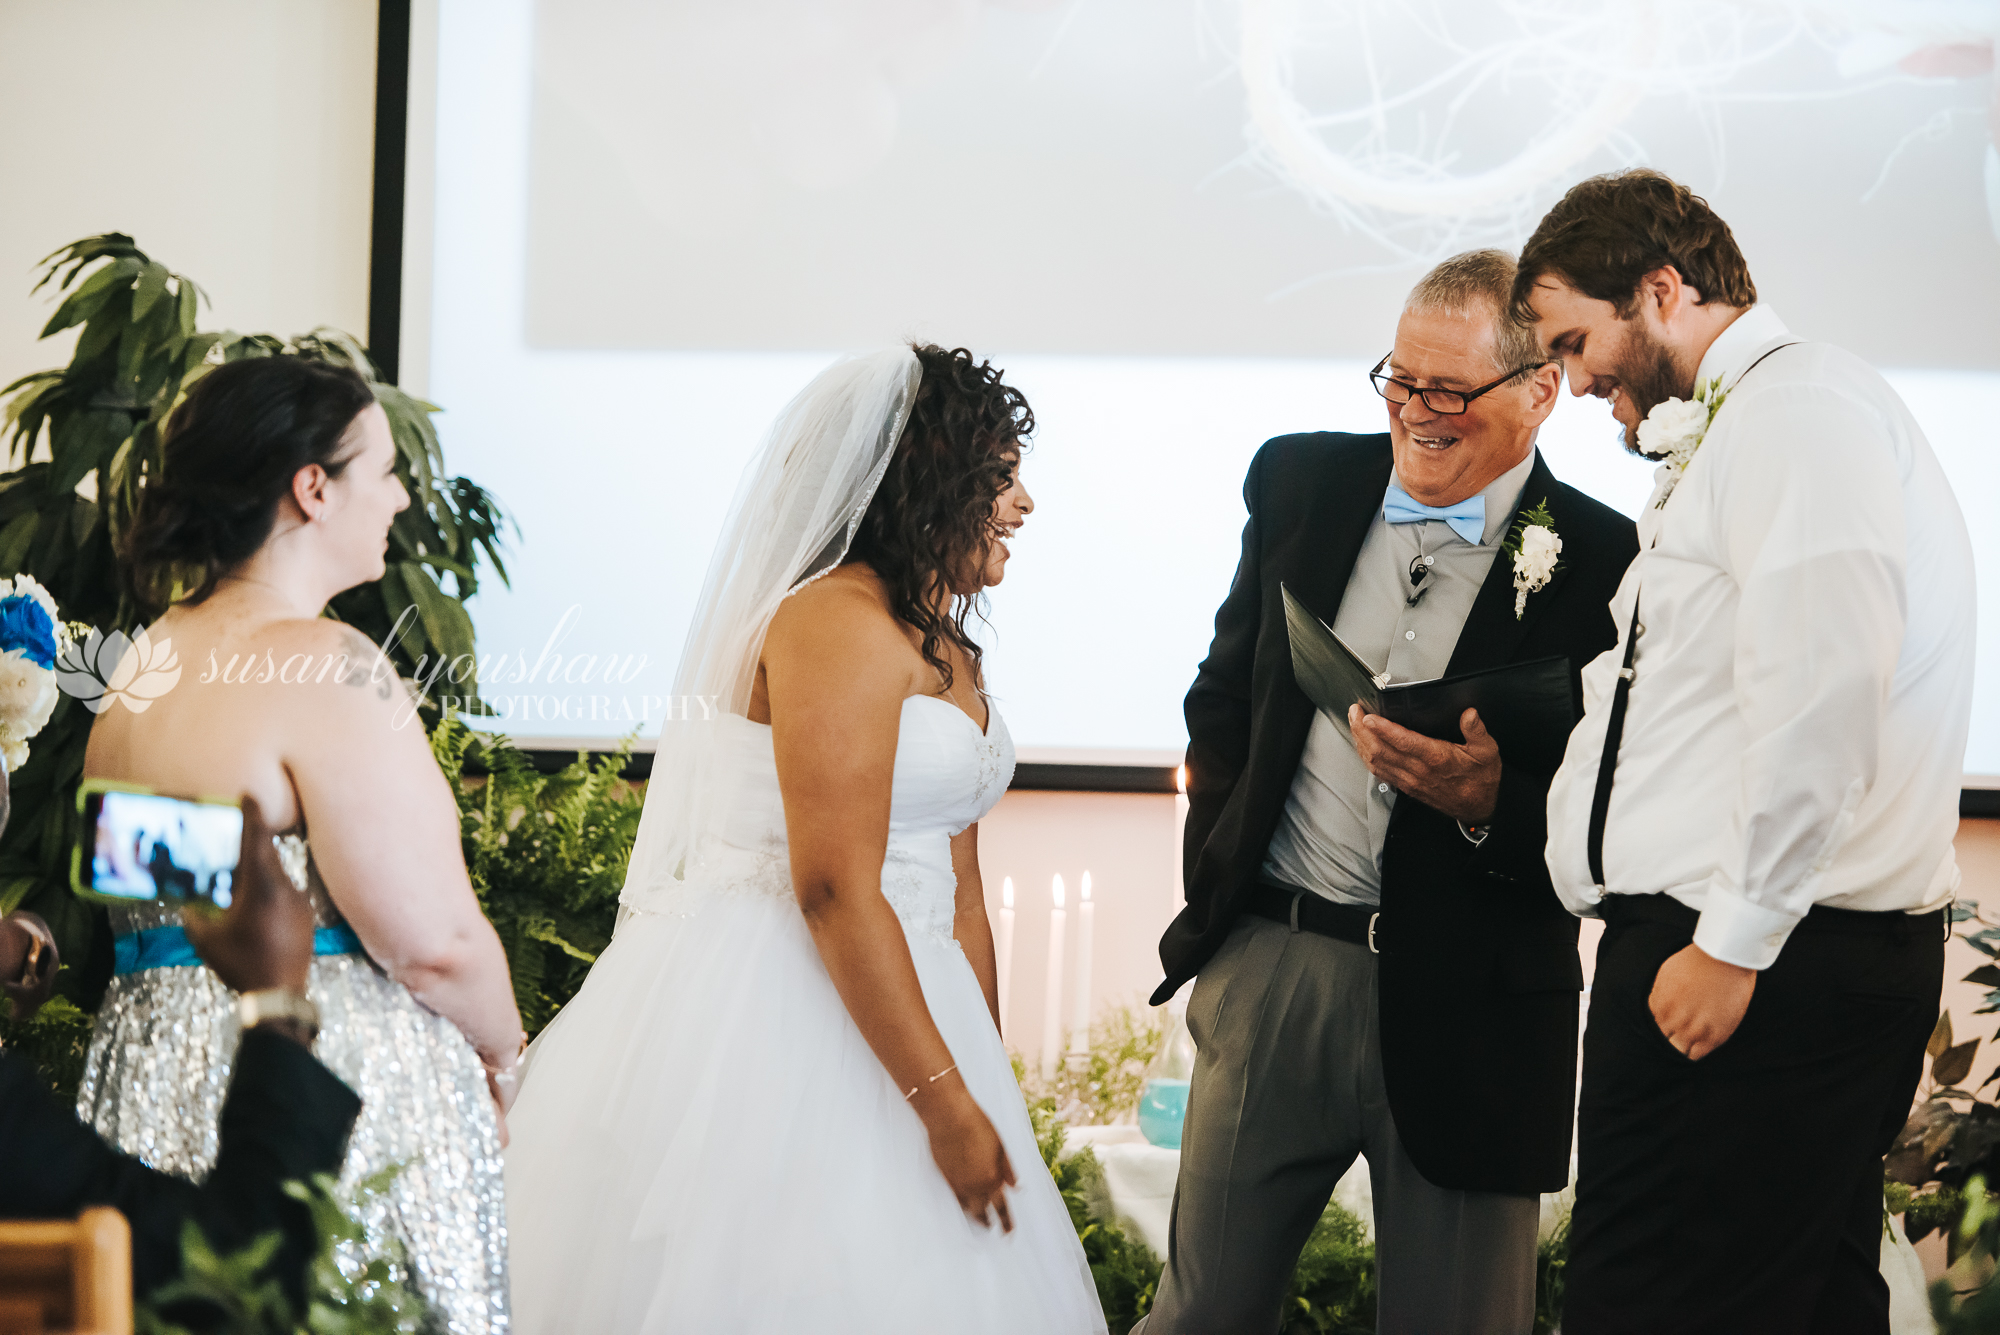 Katelyn and Wes Wedding Photos 07-13-2019 SLY Photography-67.jpg